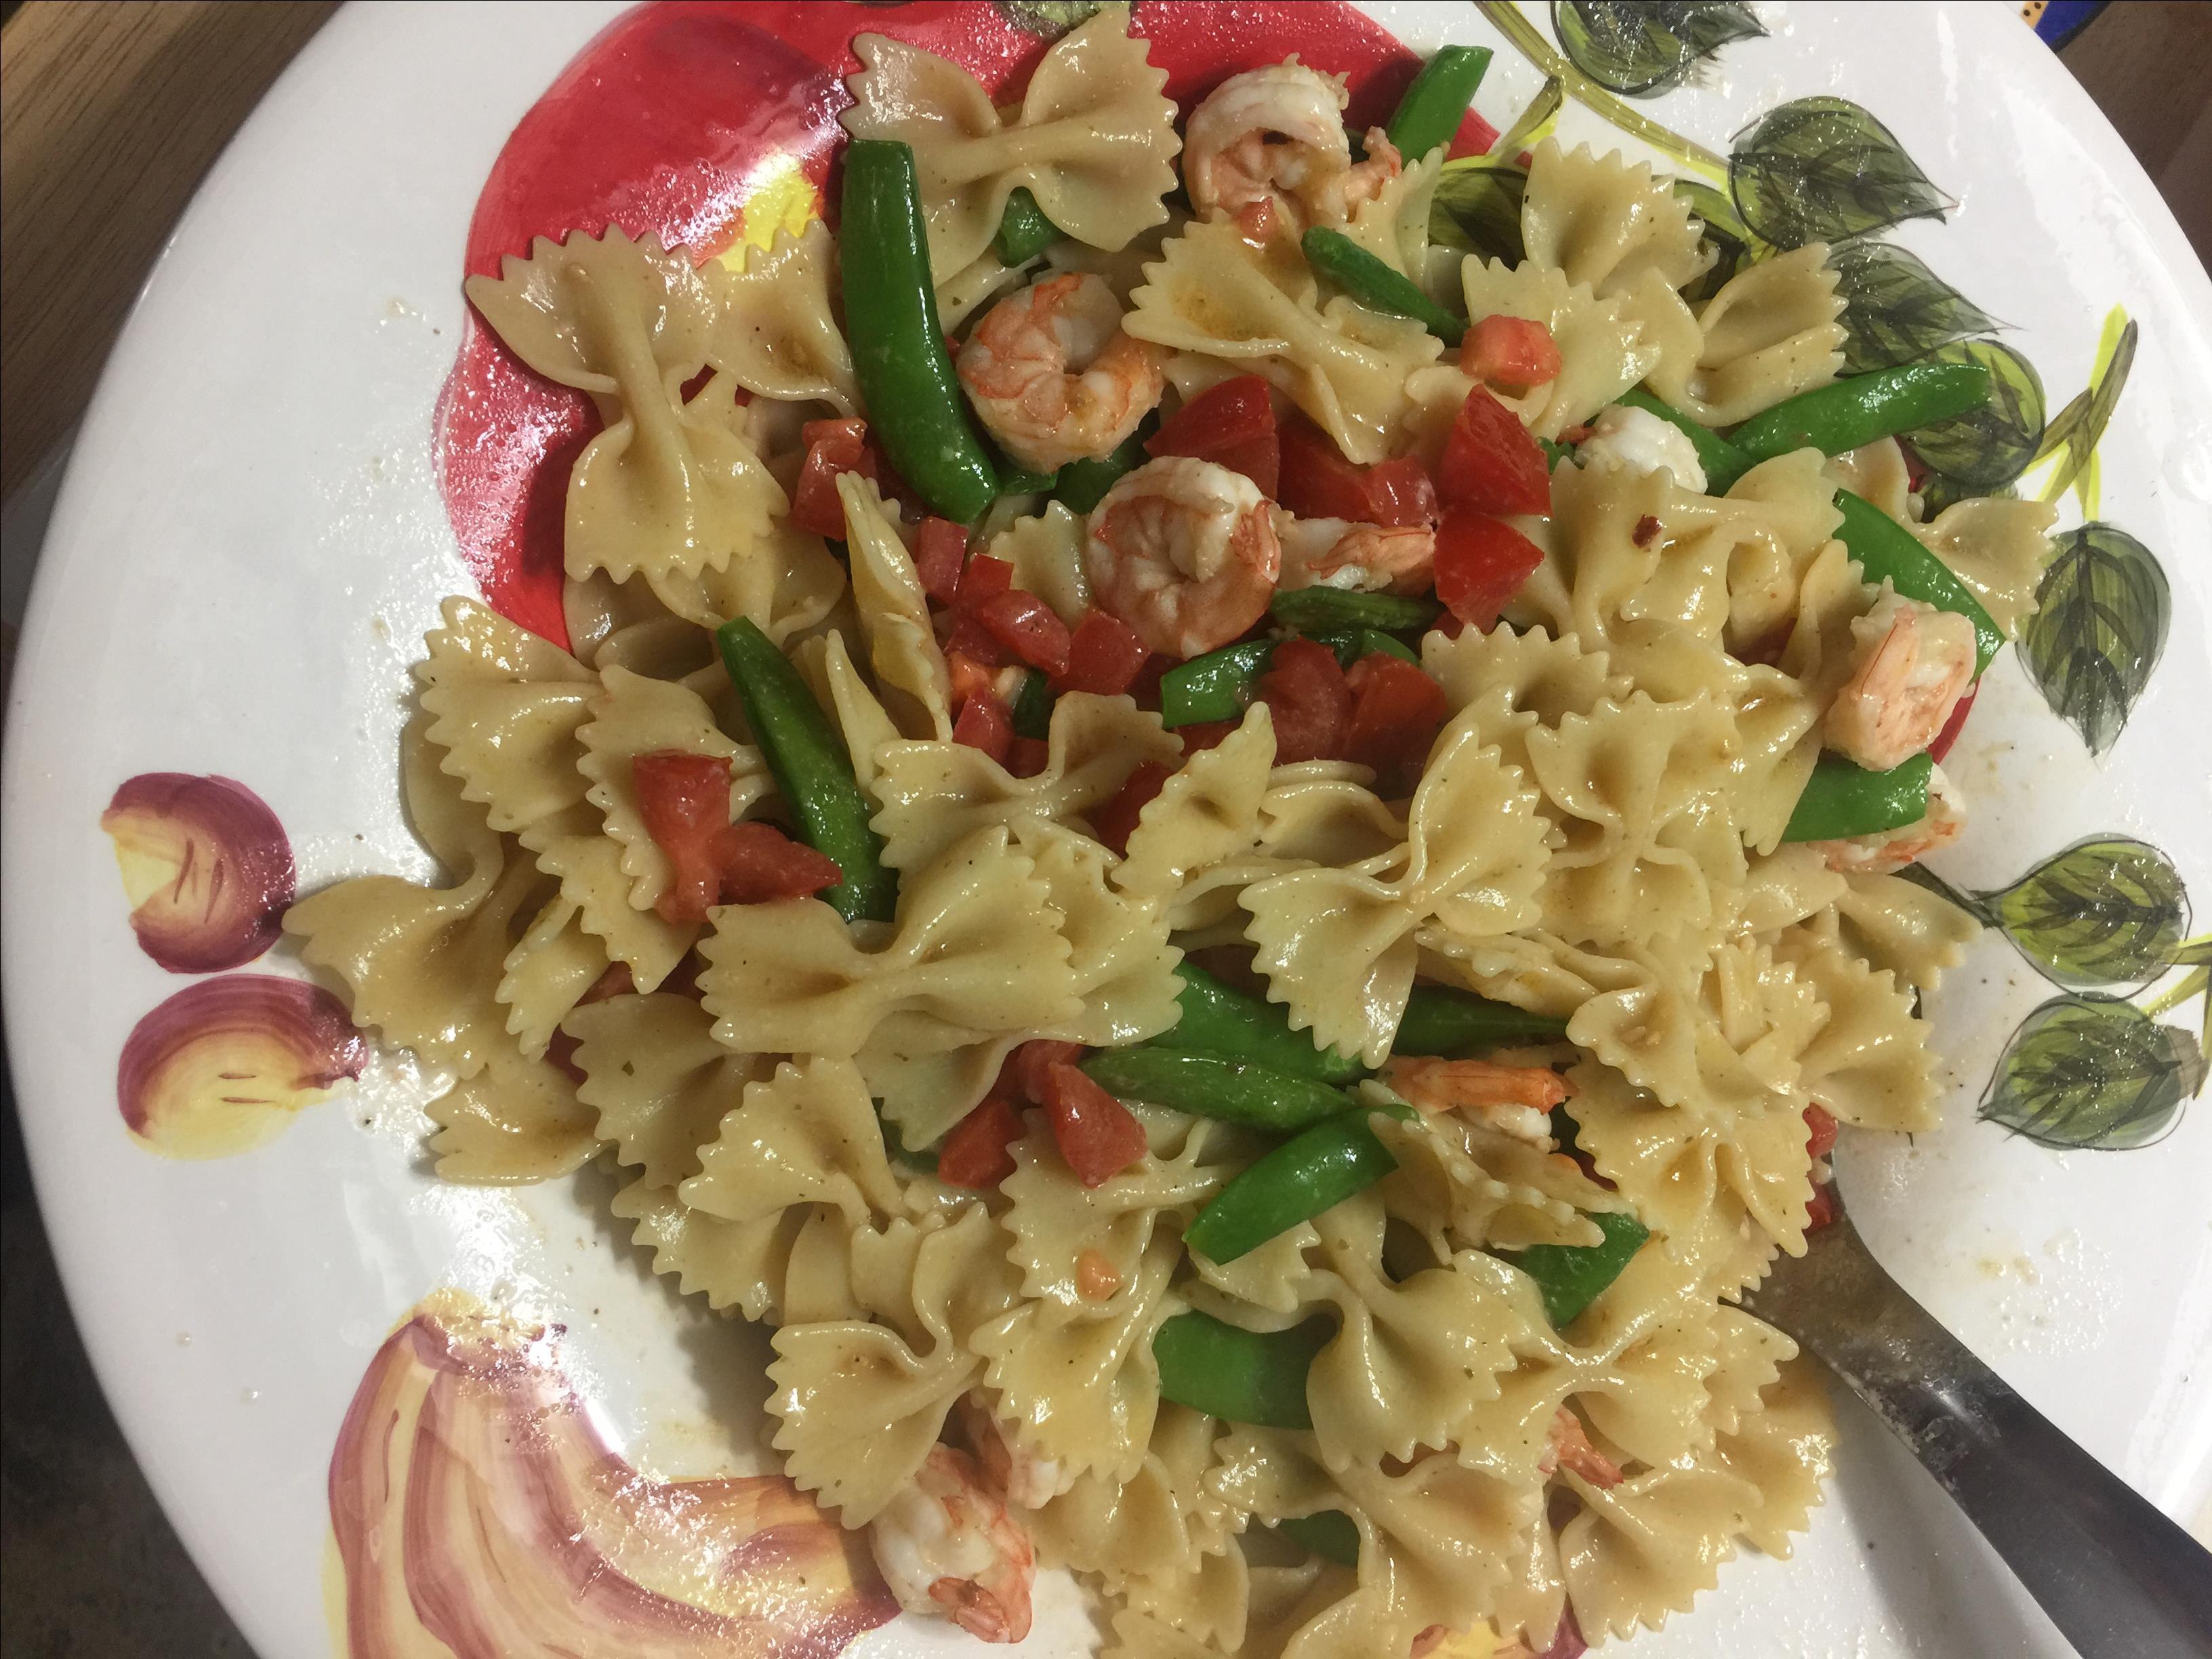 Tony's Summer Pasta Jett